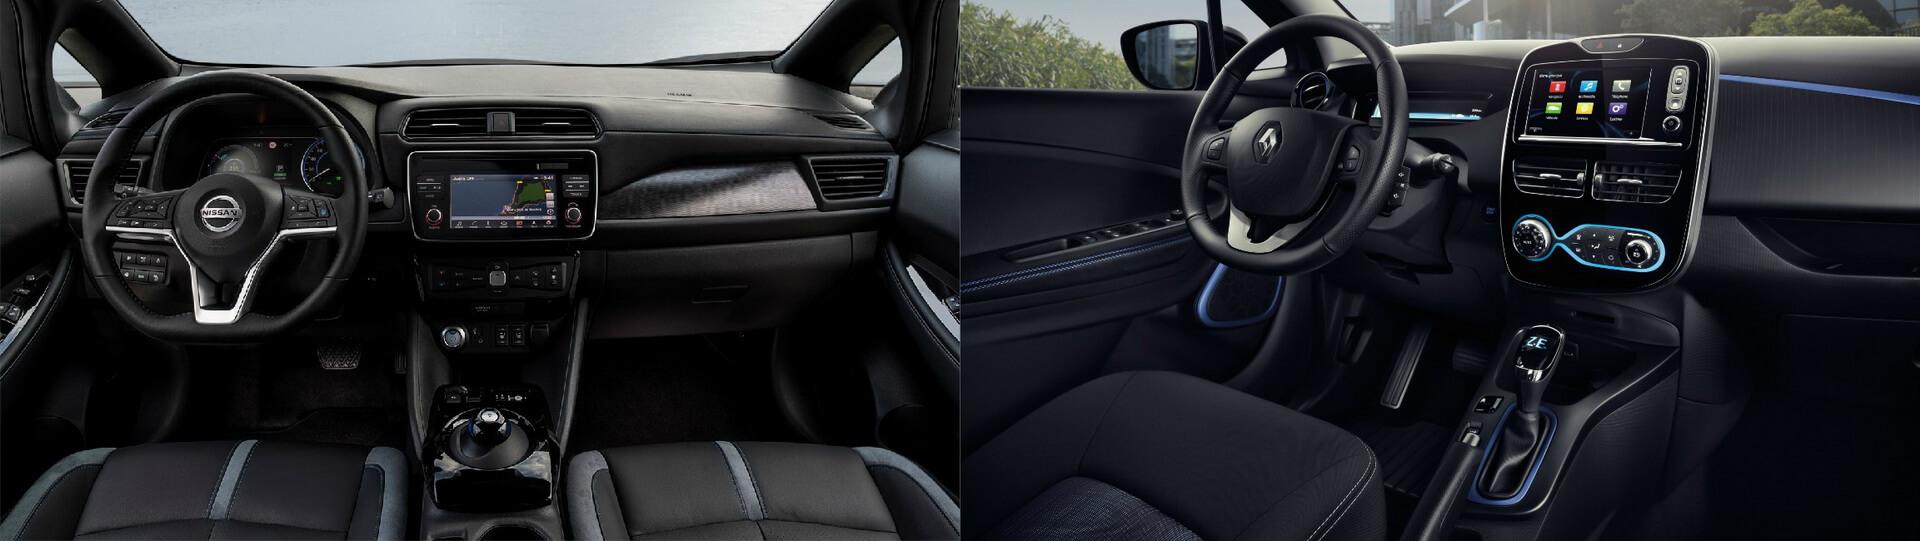 Интерьер Nissan Leaf (слева) и Renault ZOE (справа)